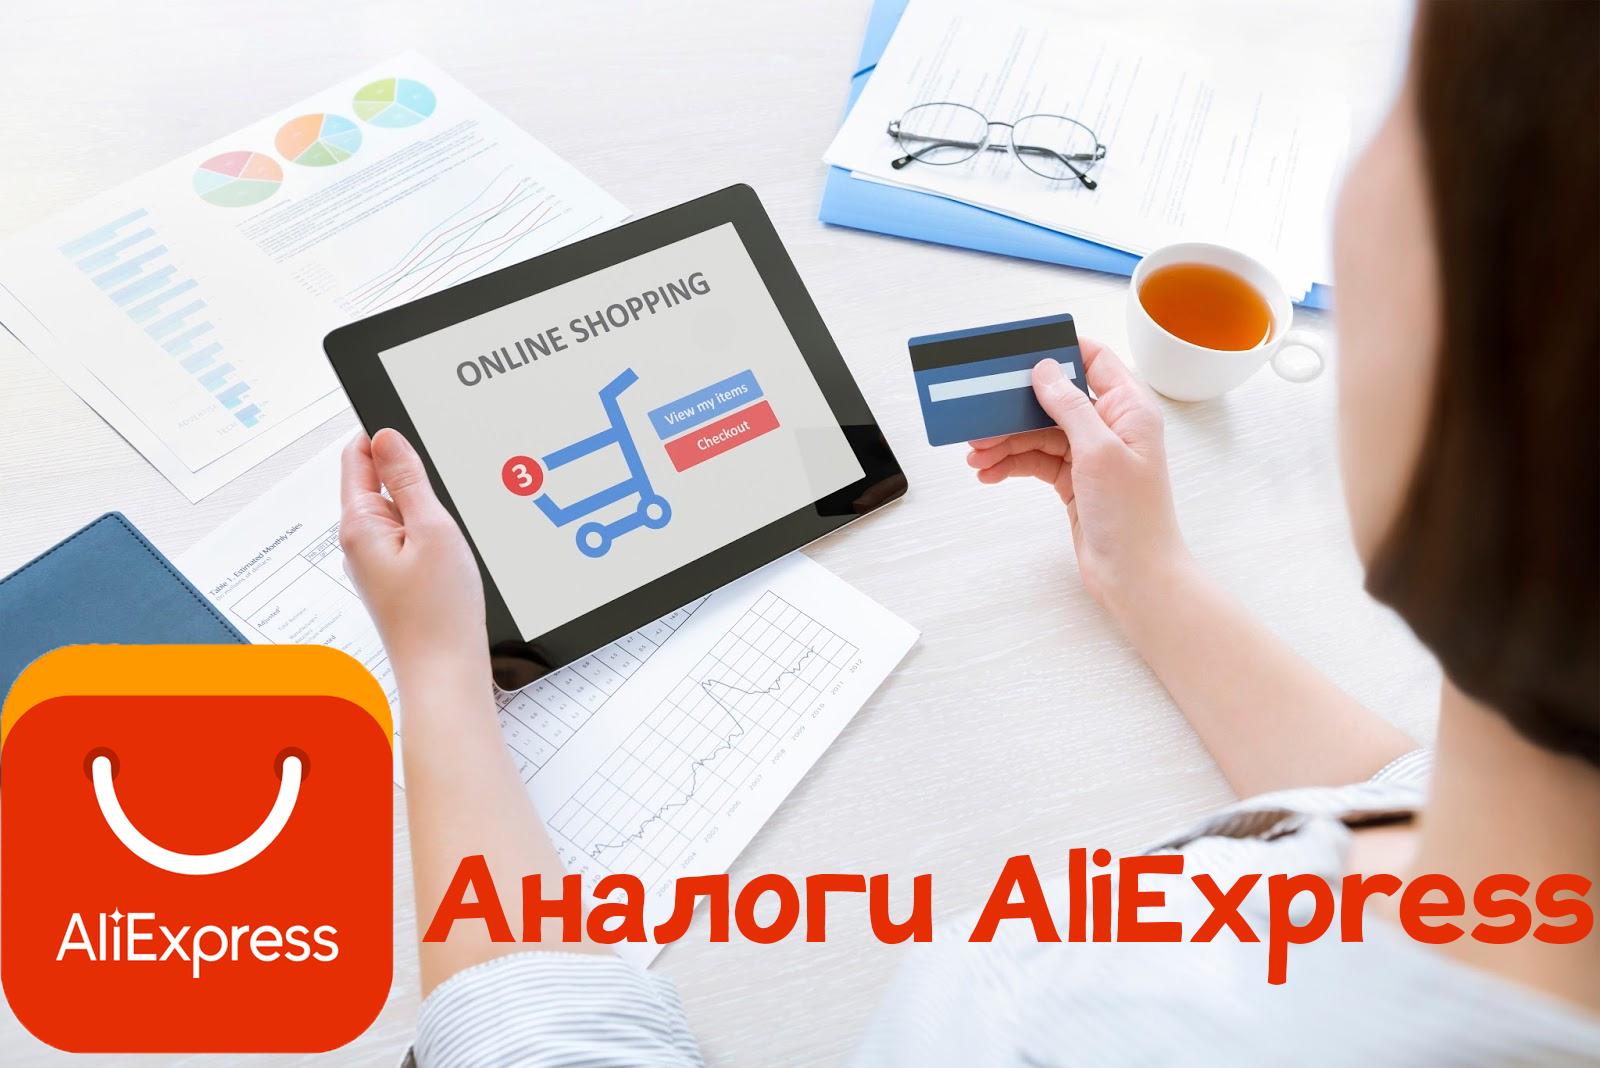 Аналоги интернет магазина Алиэкспресс